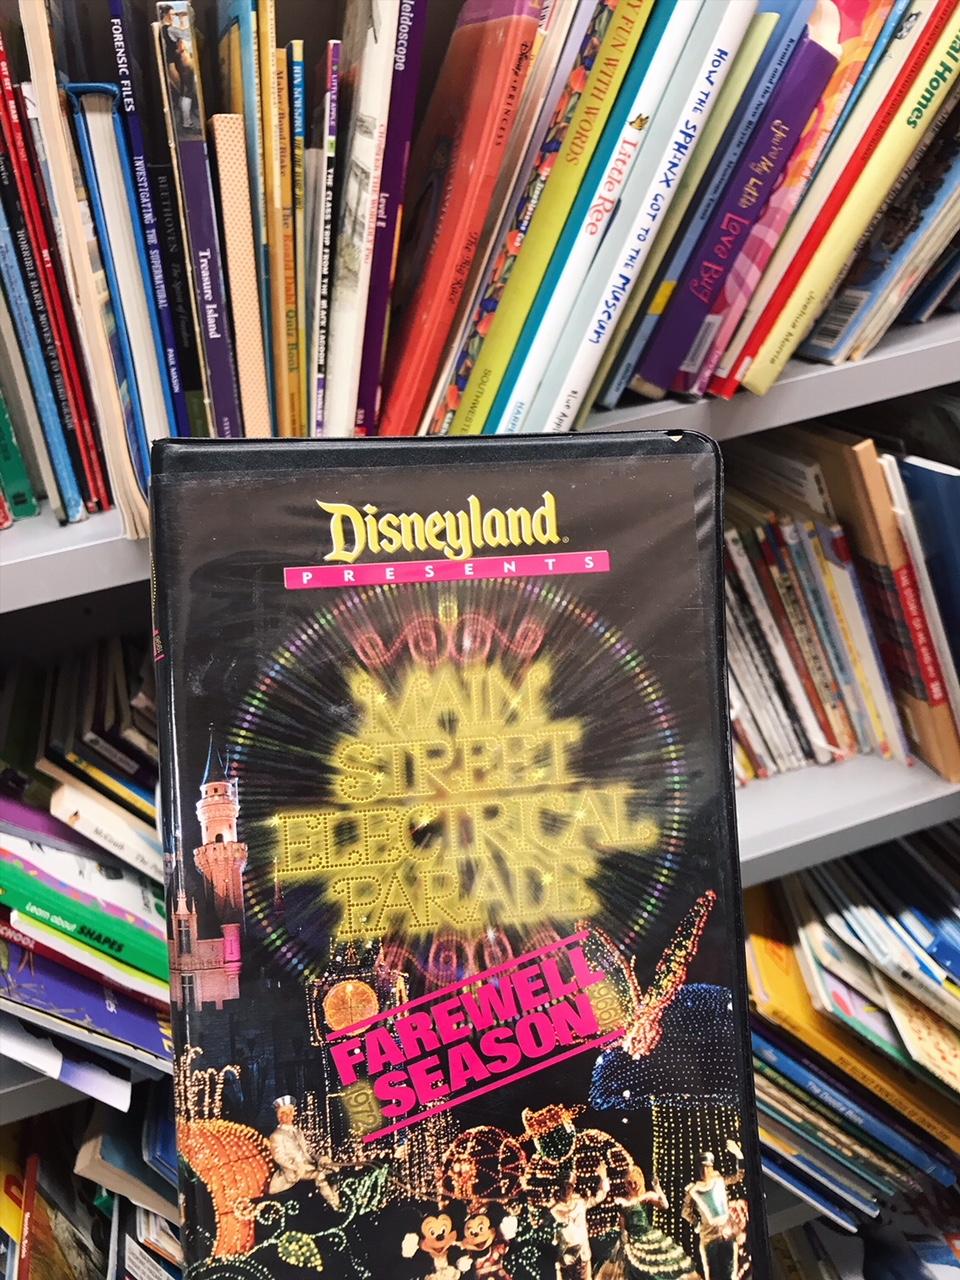 Vintage Disneyland VHS